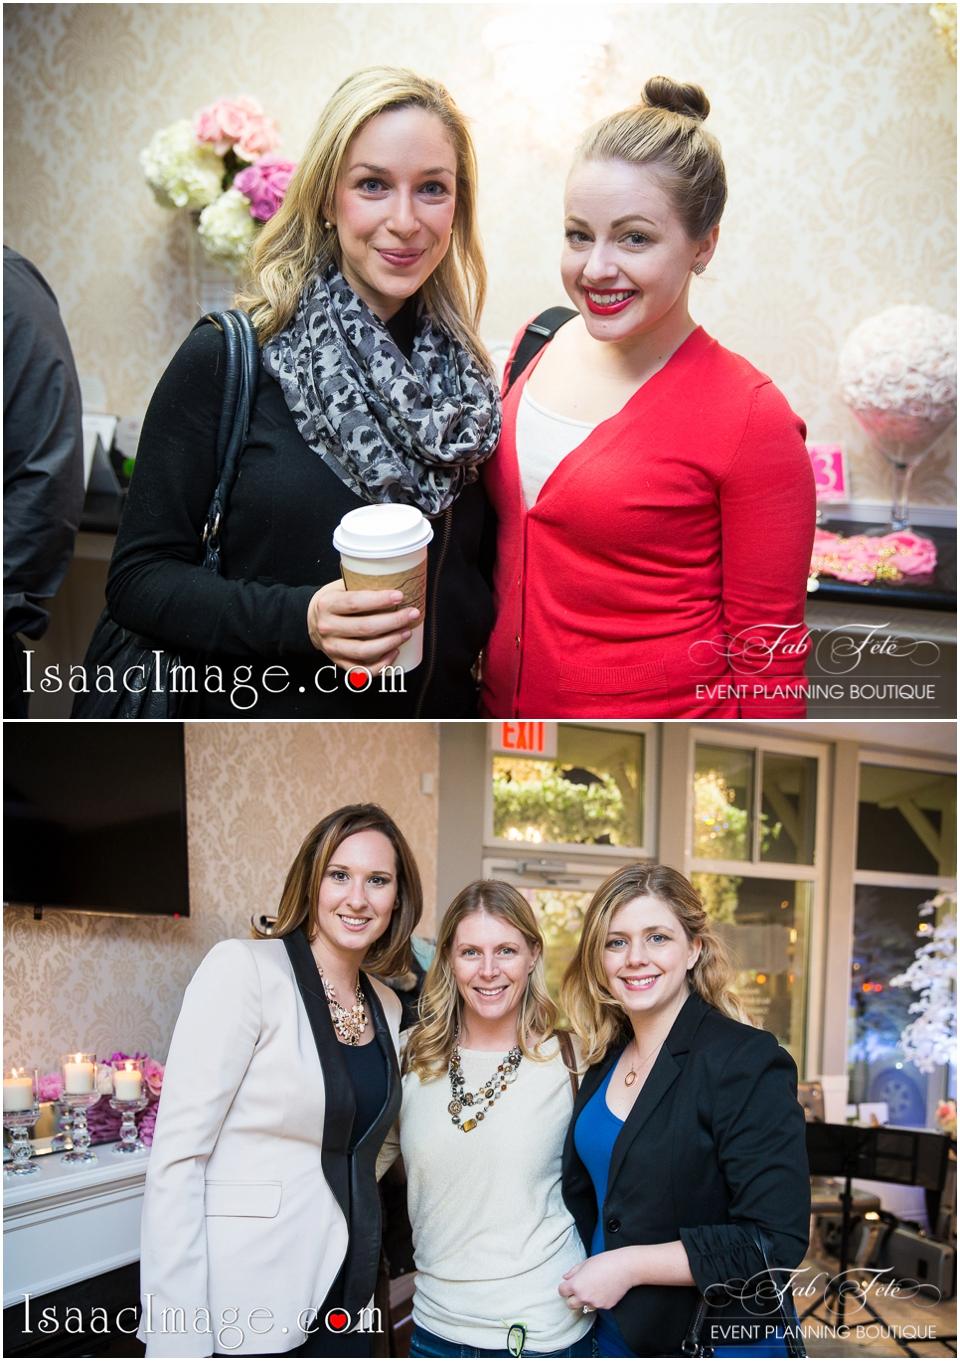 Fab Fete Toronto Wedding Event Planning Boutique open house_6496.jpg